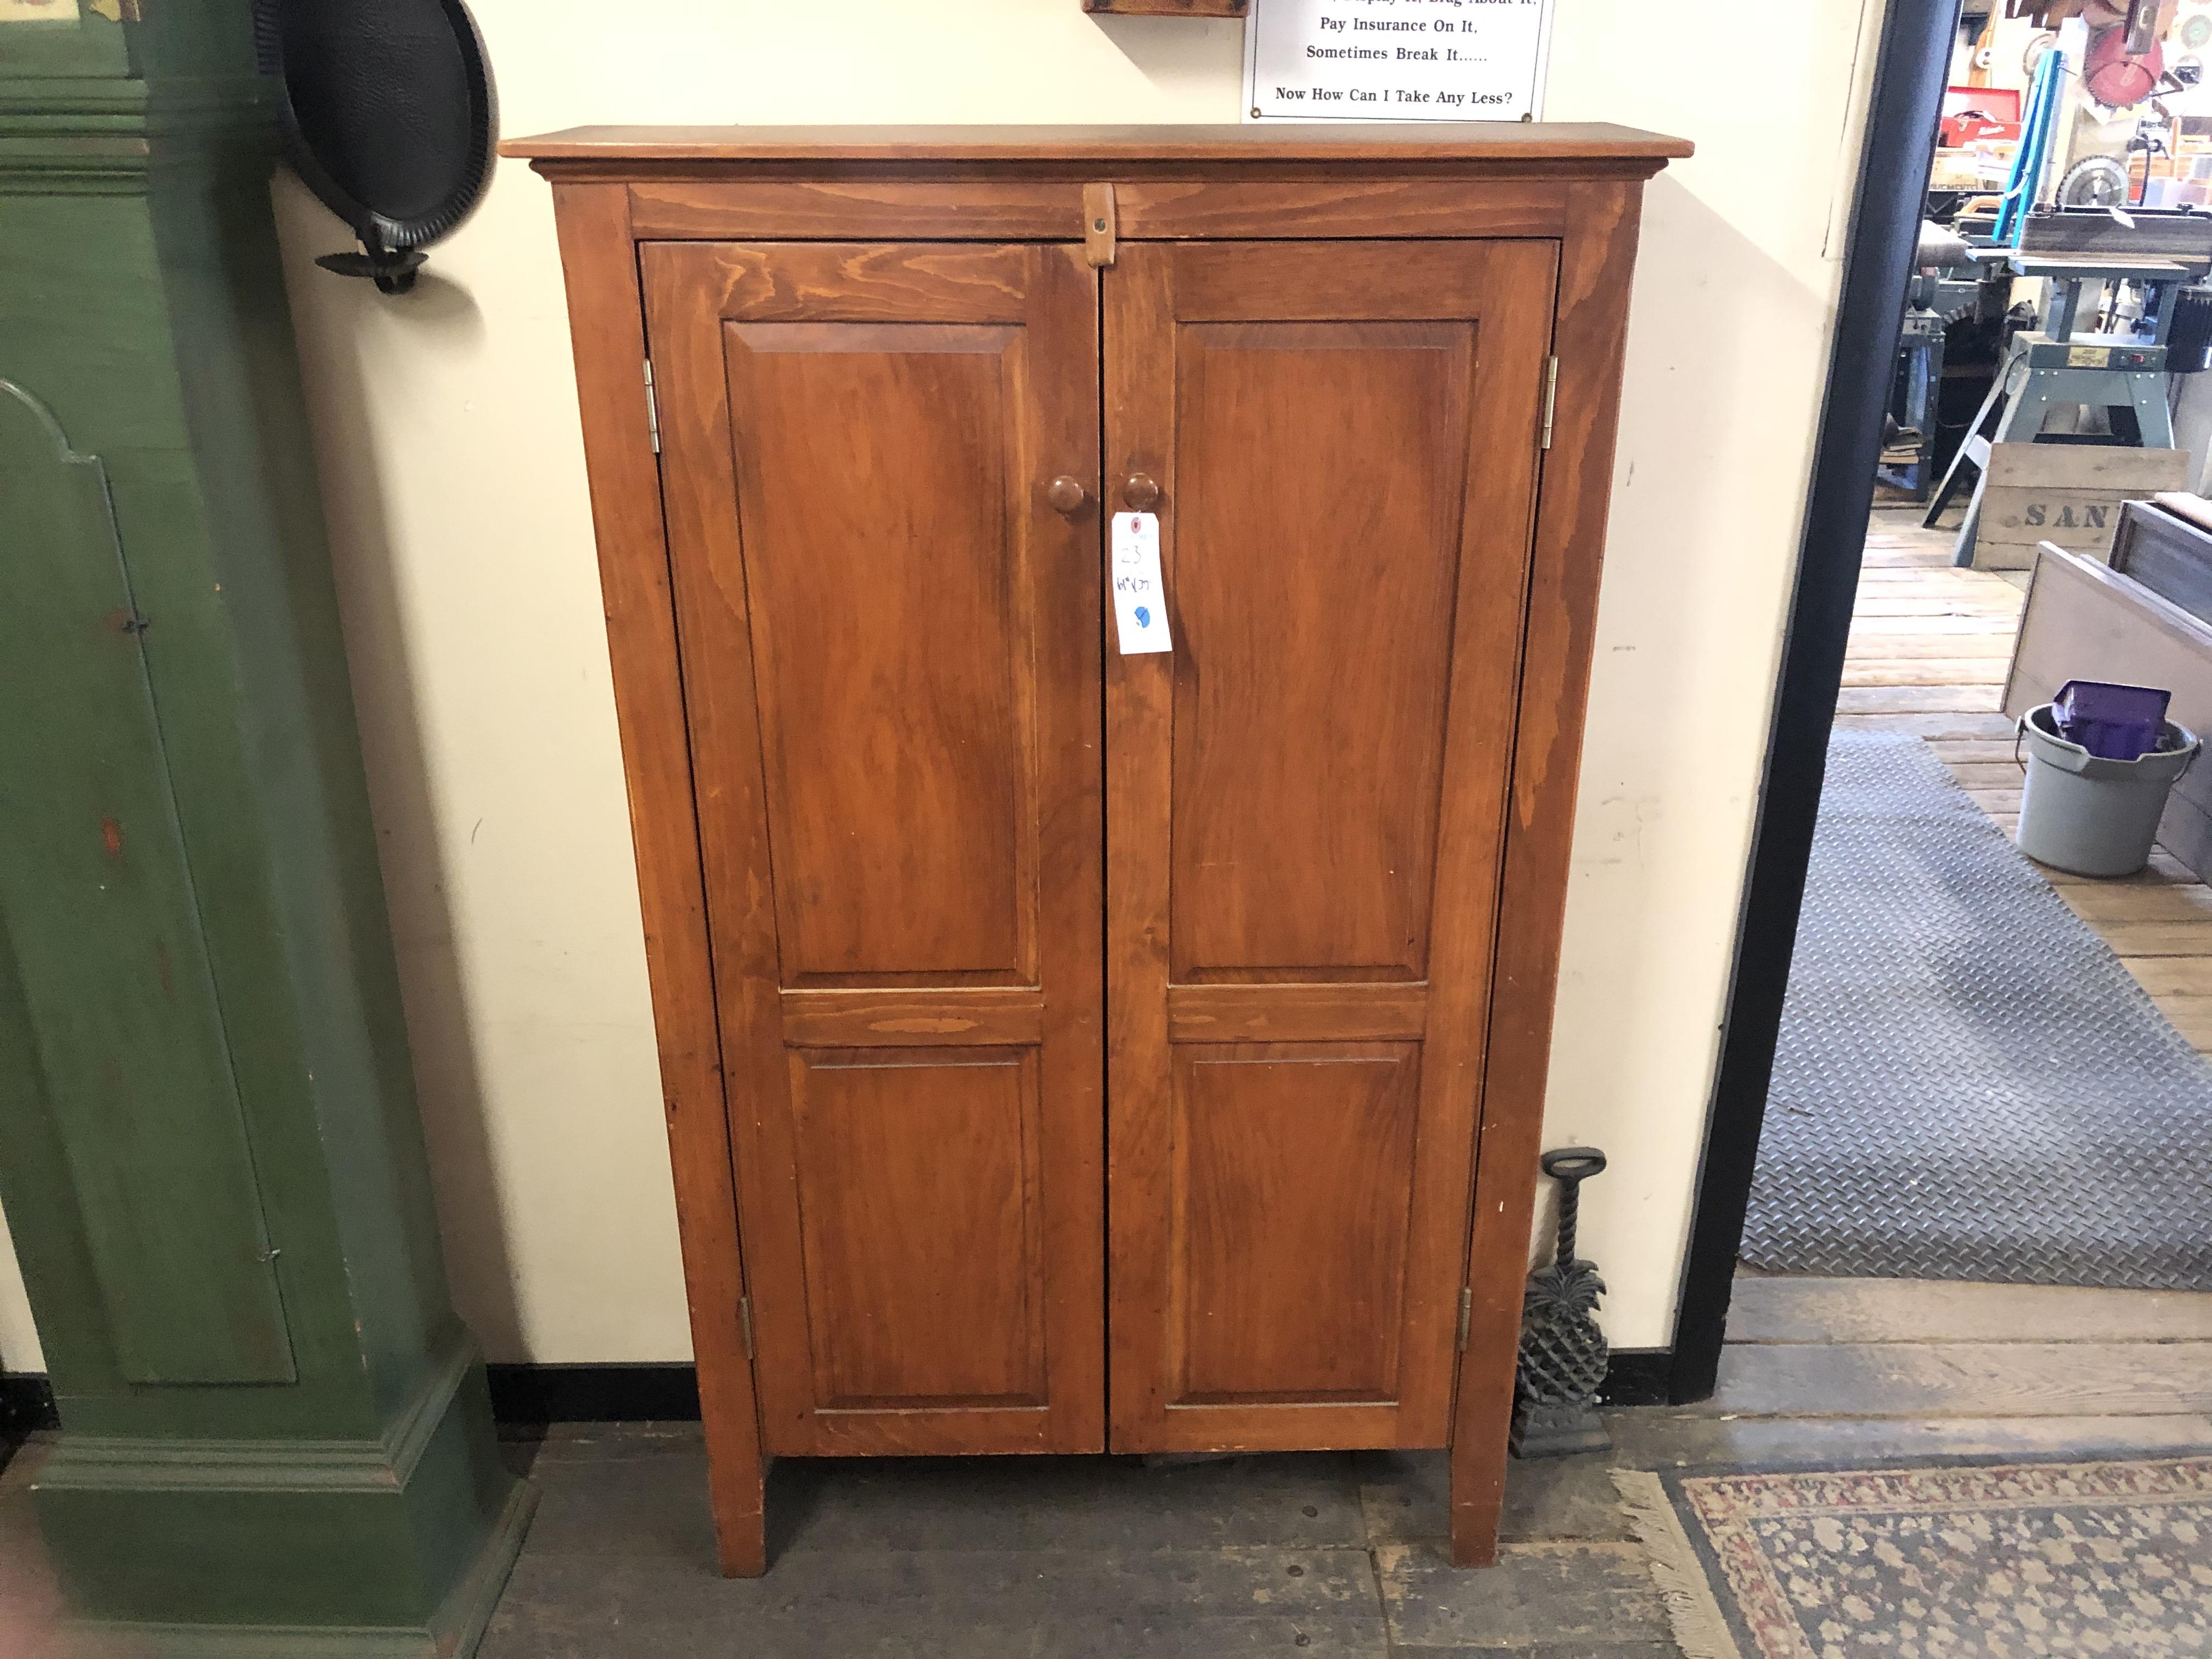 2 Door Wood Pantry Style Cabinet